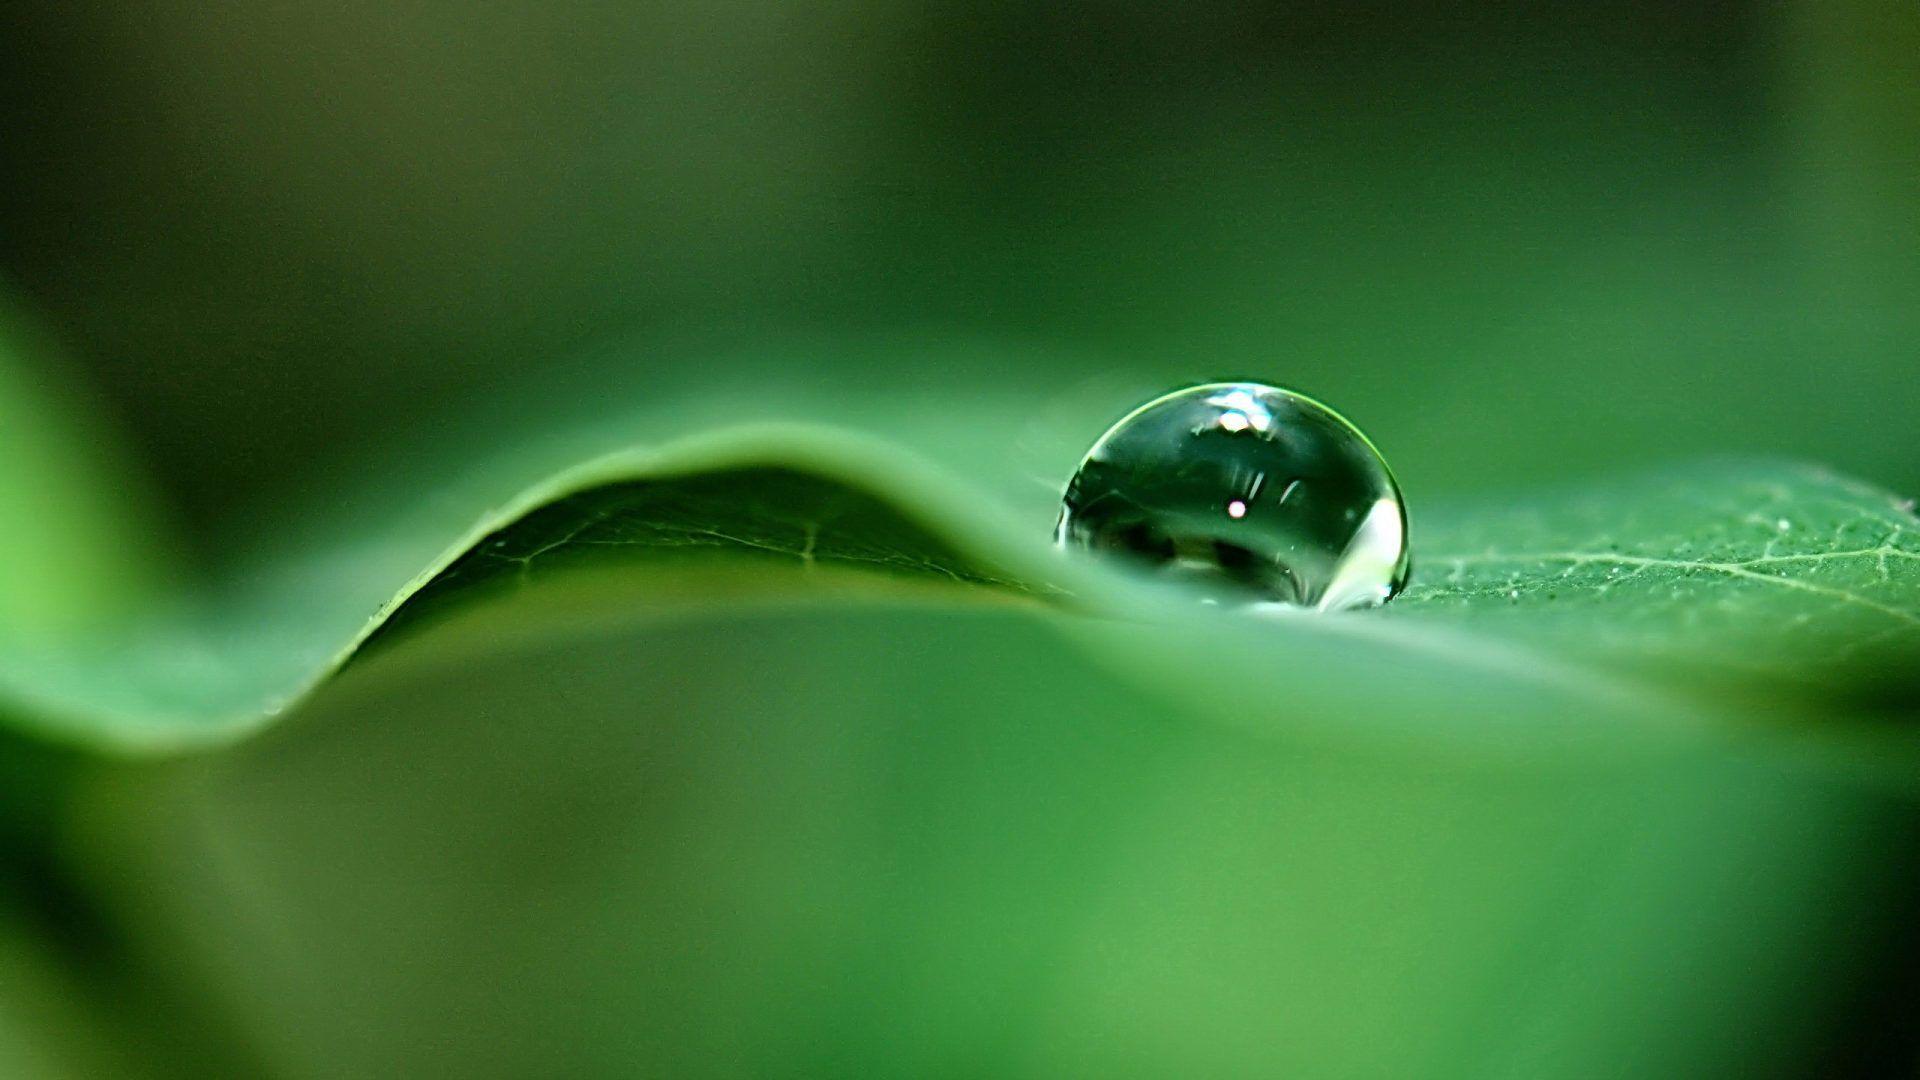 Raindrops On Glass Hd Desktop Wallpaper High Definition Dew Drop Photography Dew Drops Water Drop On Leaf